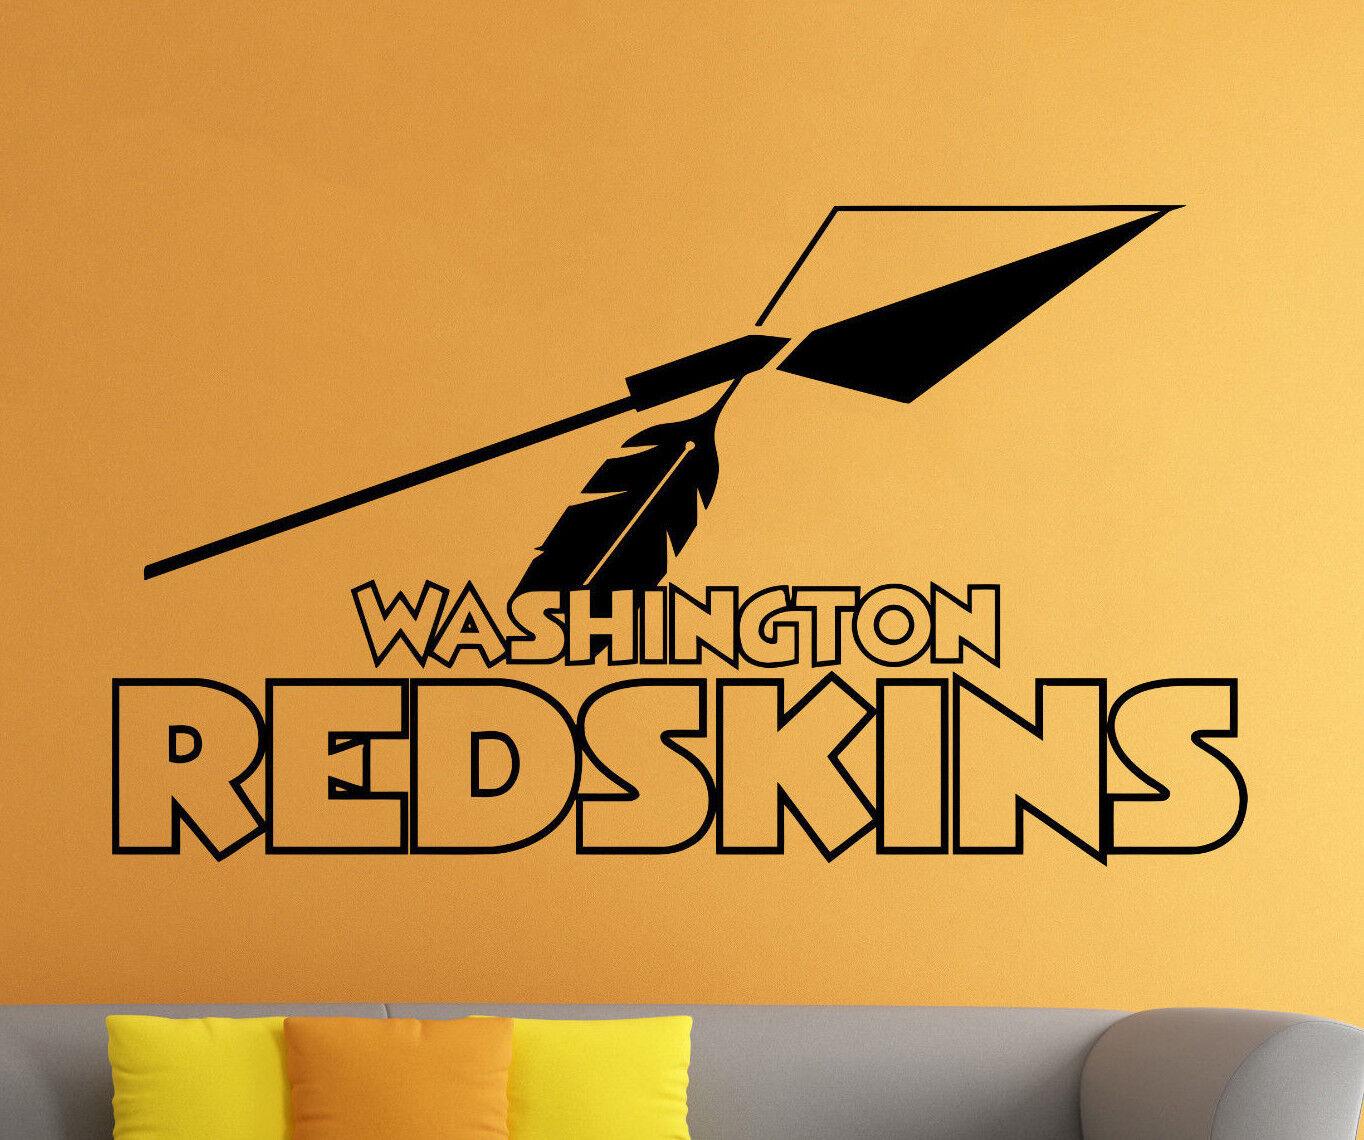 NFL Washington Redskins Wall Decal Vinyl Sticker Football Lo